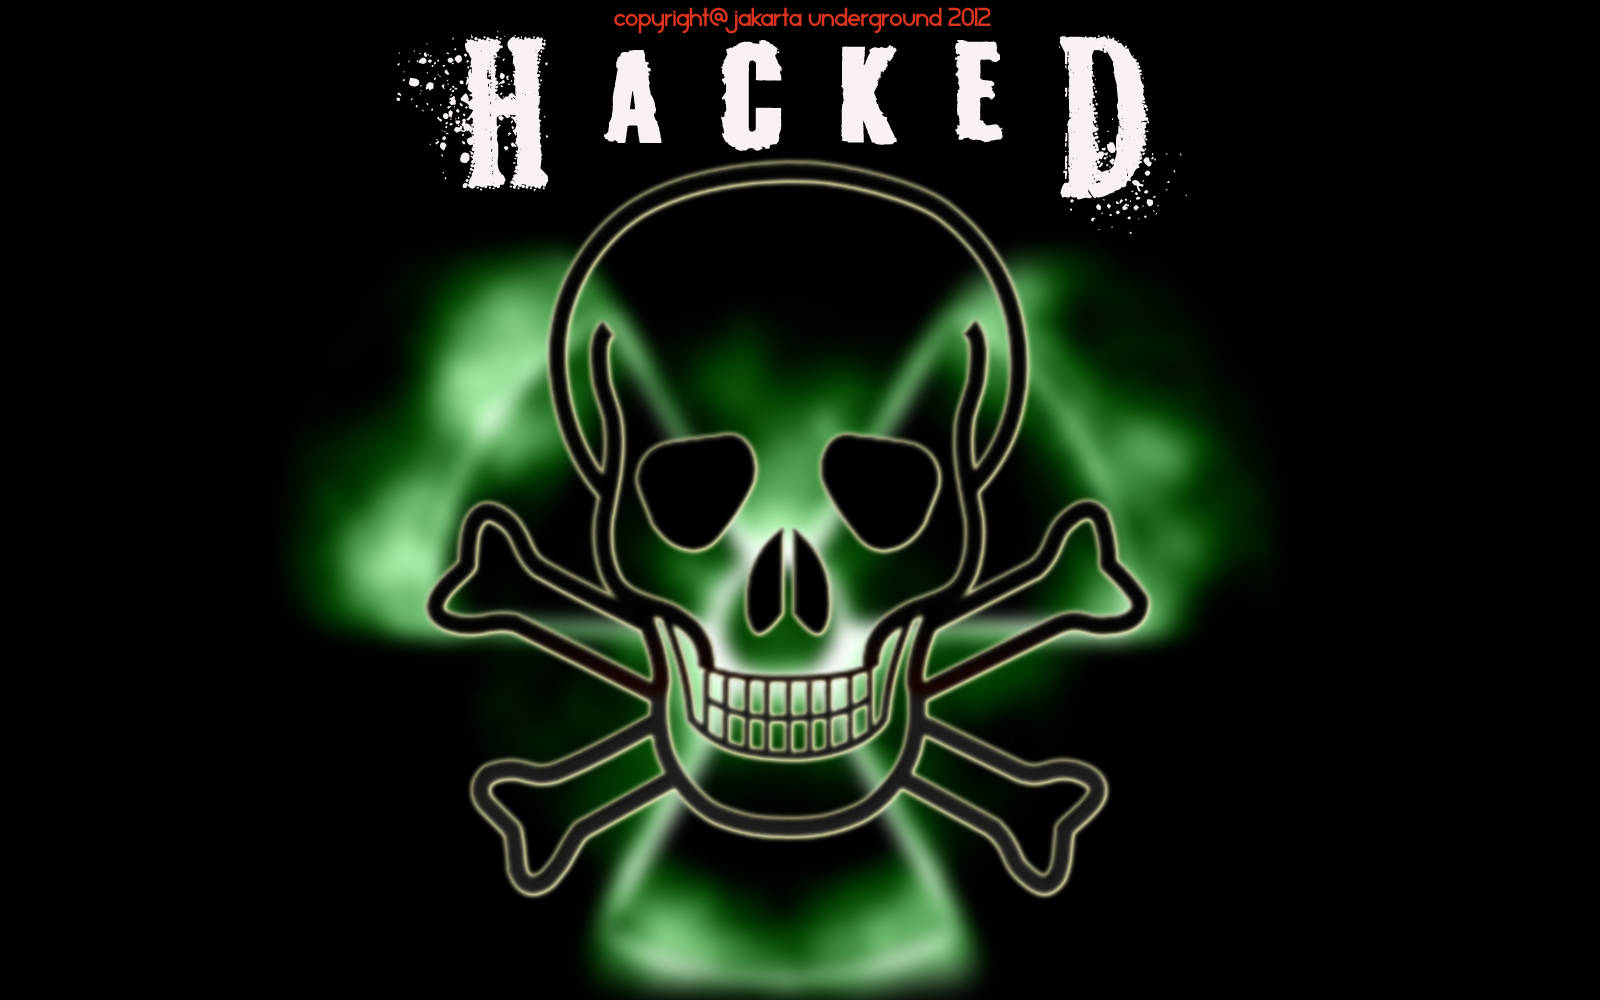 Deep Web Content: GAMBAR DAN LOGO HACKER